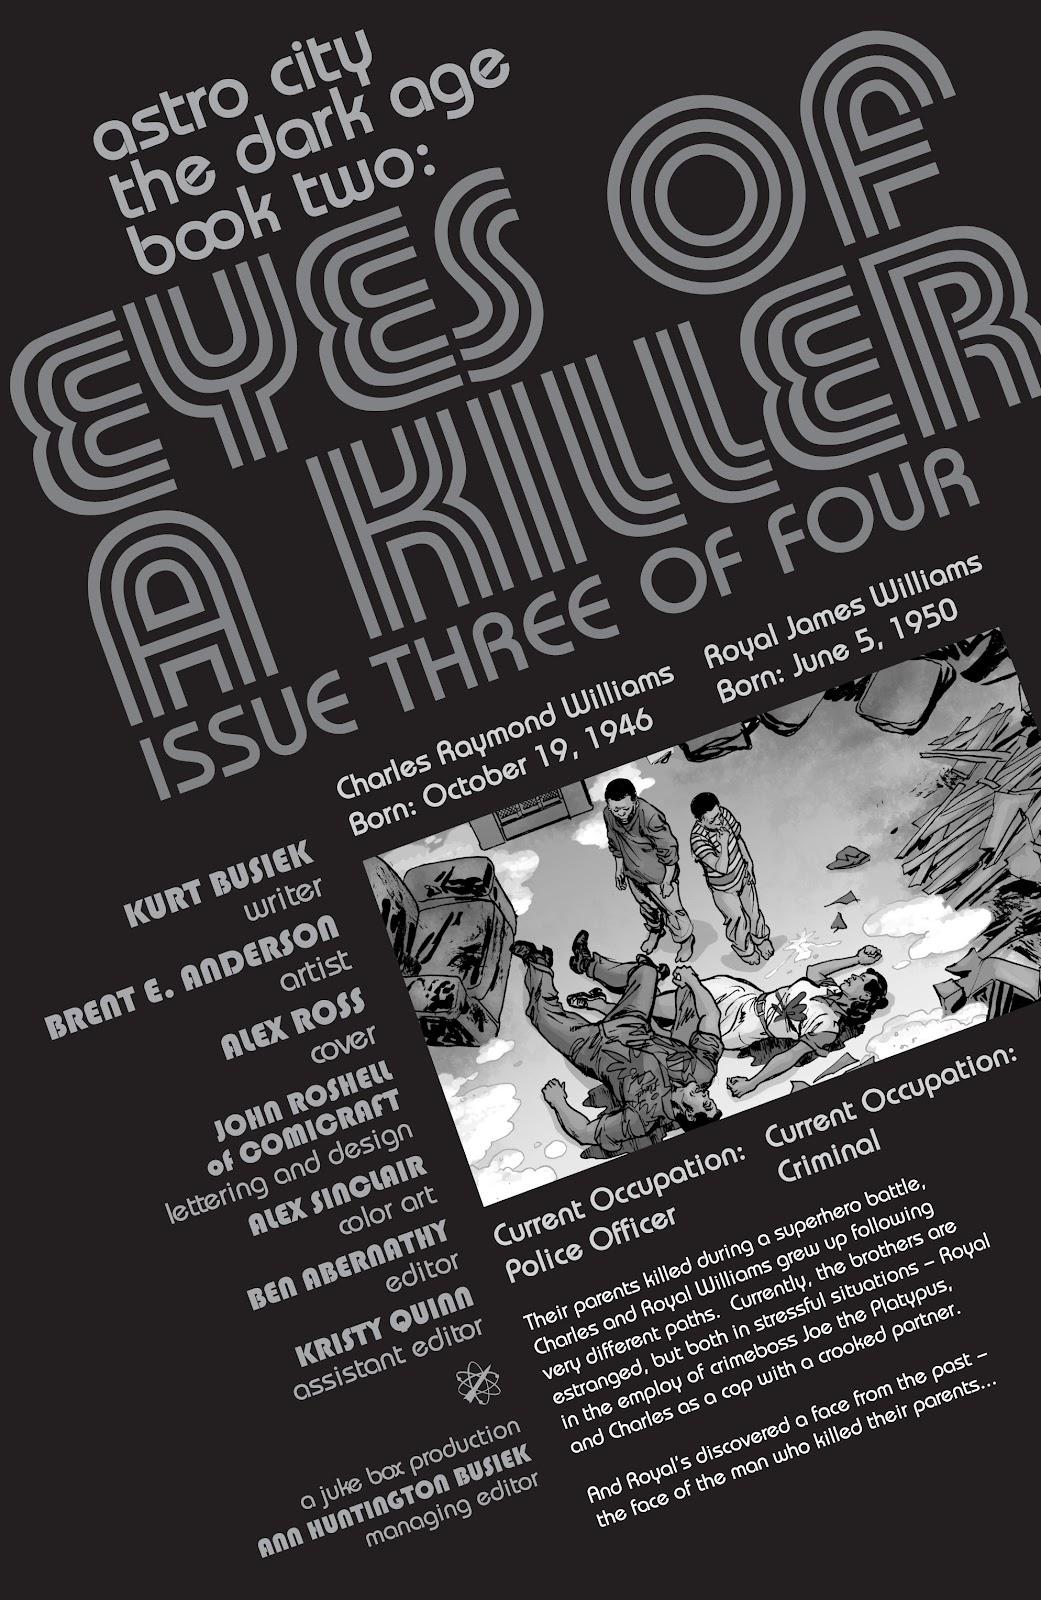 Astro City: Dark Age/Book Two Issue #3 #3 - English 2